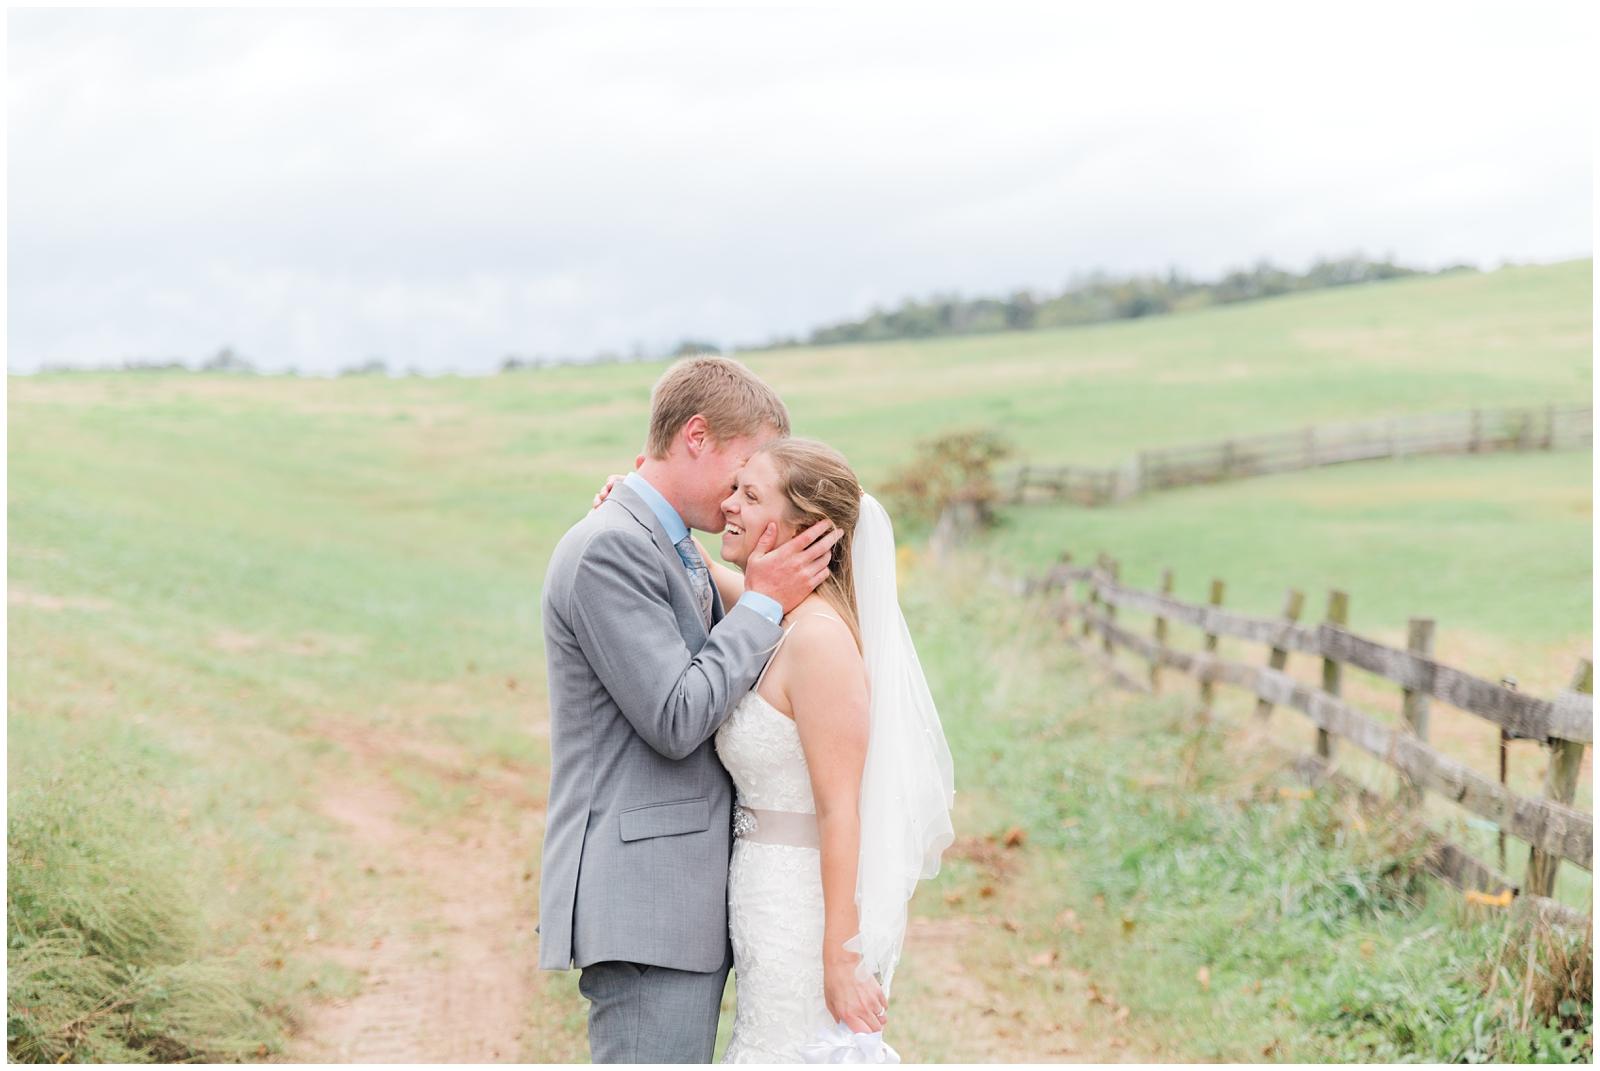 marietta-ohio-fall-wedding-LRA-Photo_0017.jpg